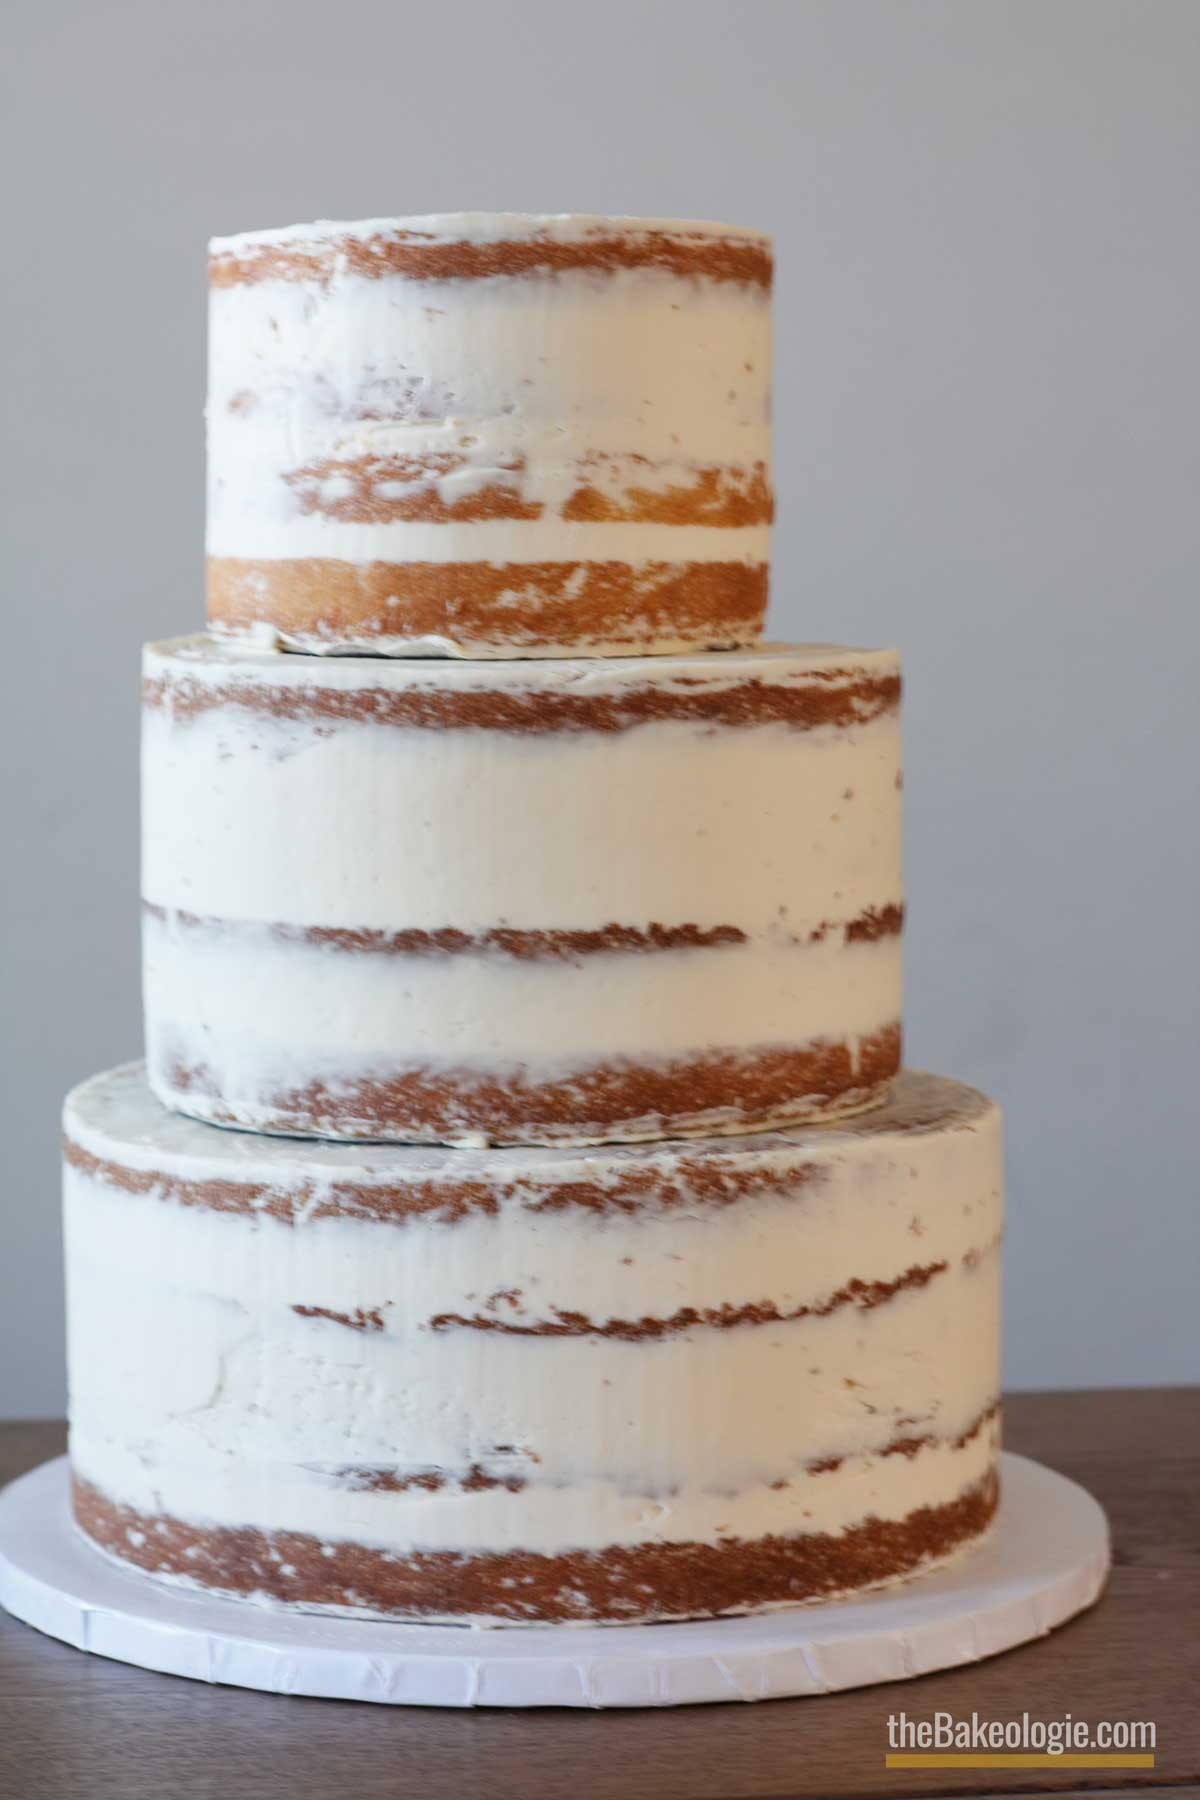 3-tiered wedding cake with crumb coat